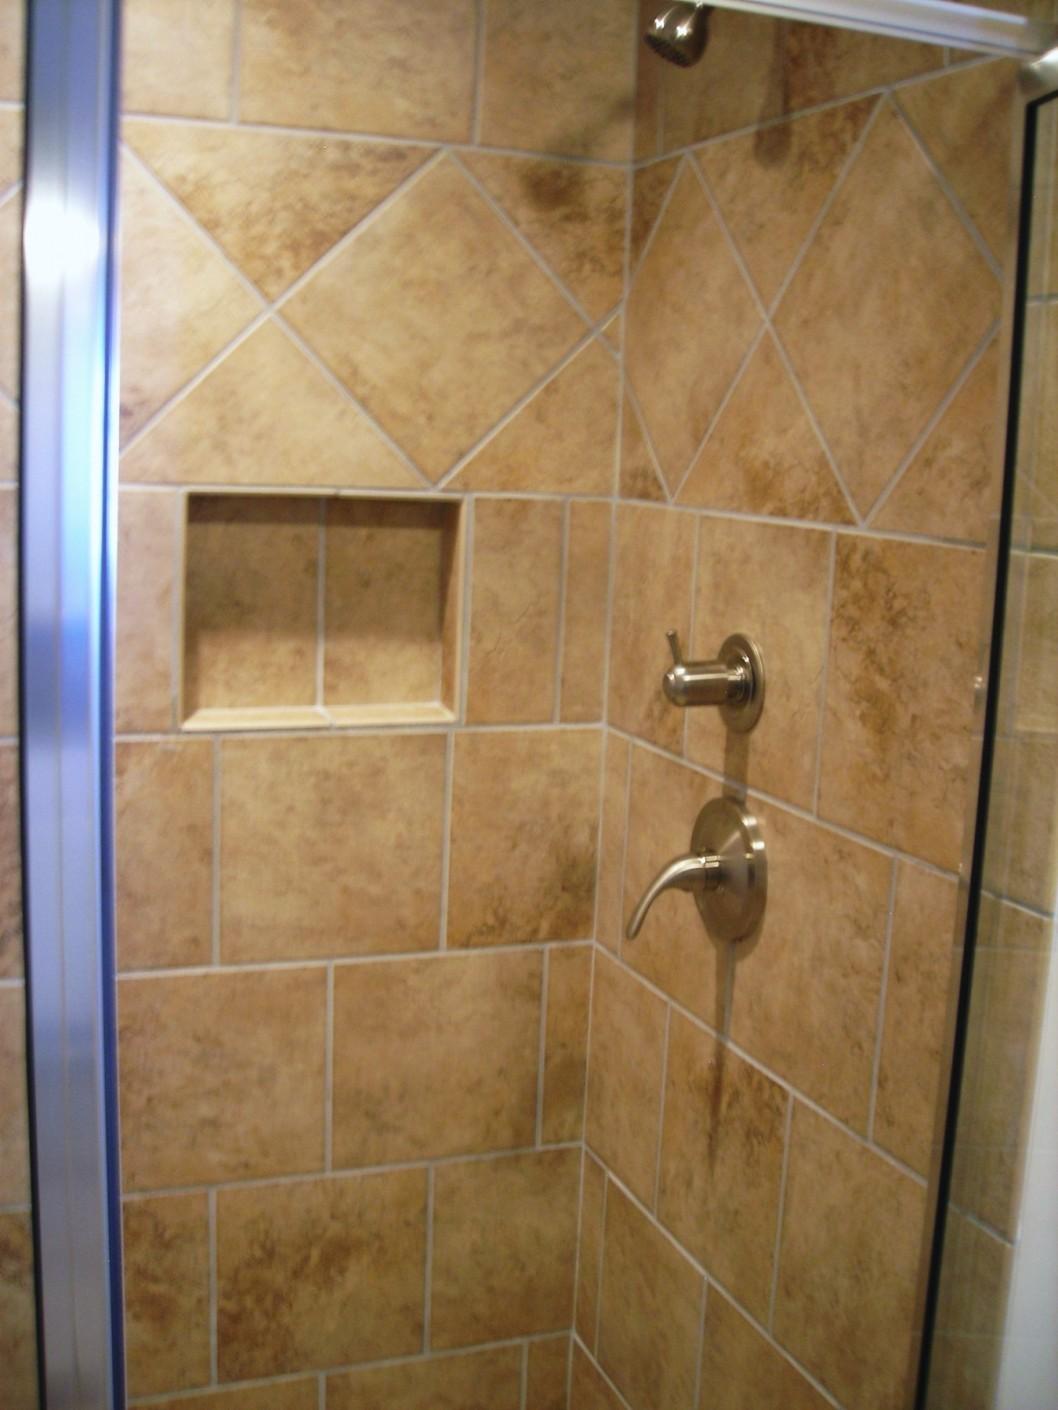 bathroom-bathroom-remodel-kitchen-remodel-paint-for-tiles-in-bathroom-bathroom-designs-pictures-bathroom-designs-photos-tile-bathroom-wall-ideas-how-to-tile-a-bathroom-wall-bathroom-tiles-pictur